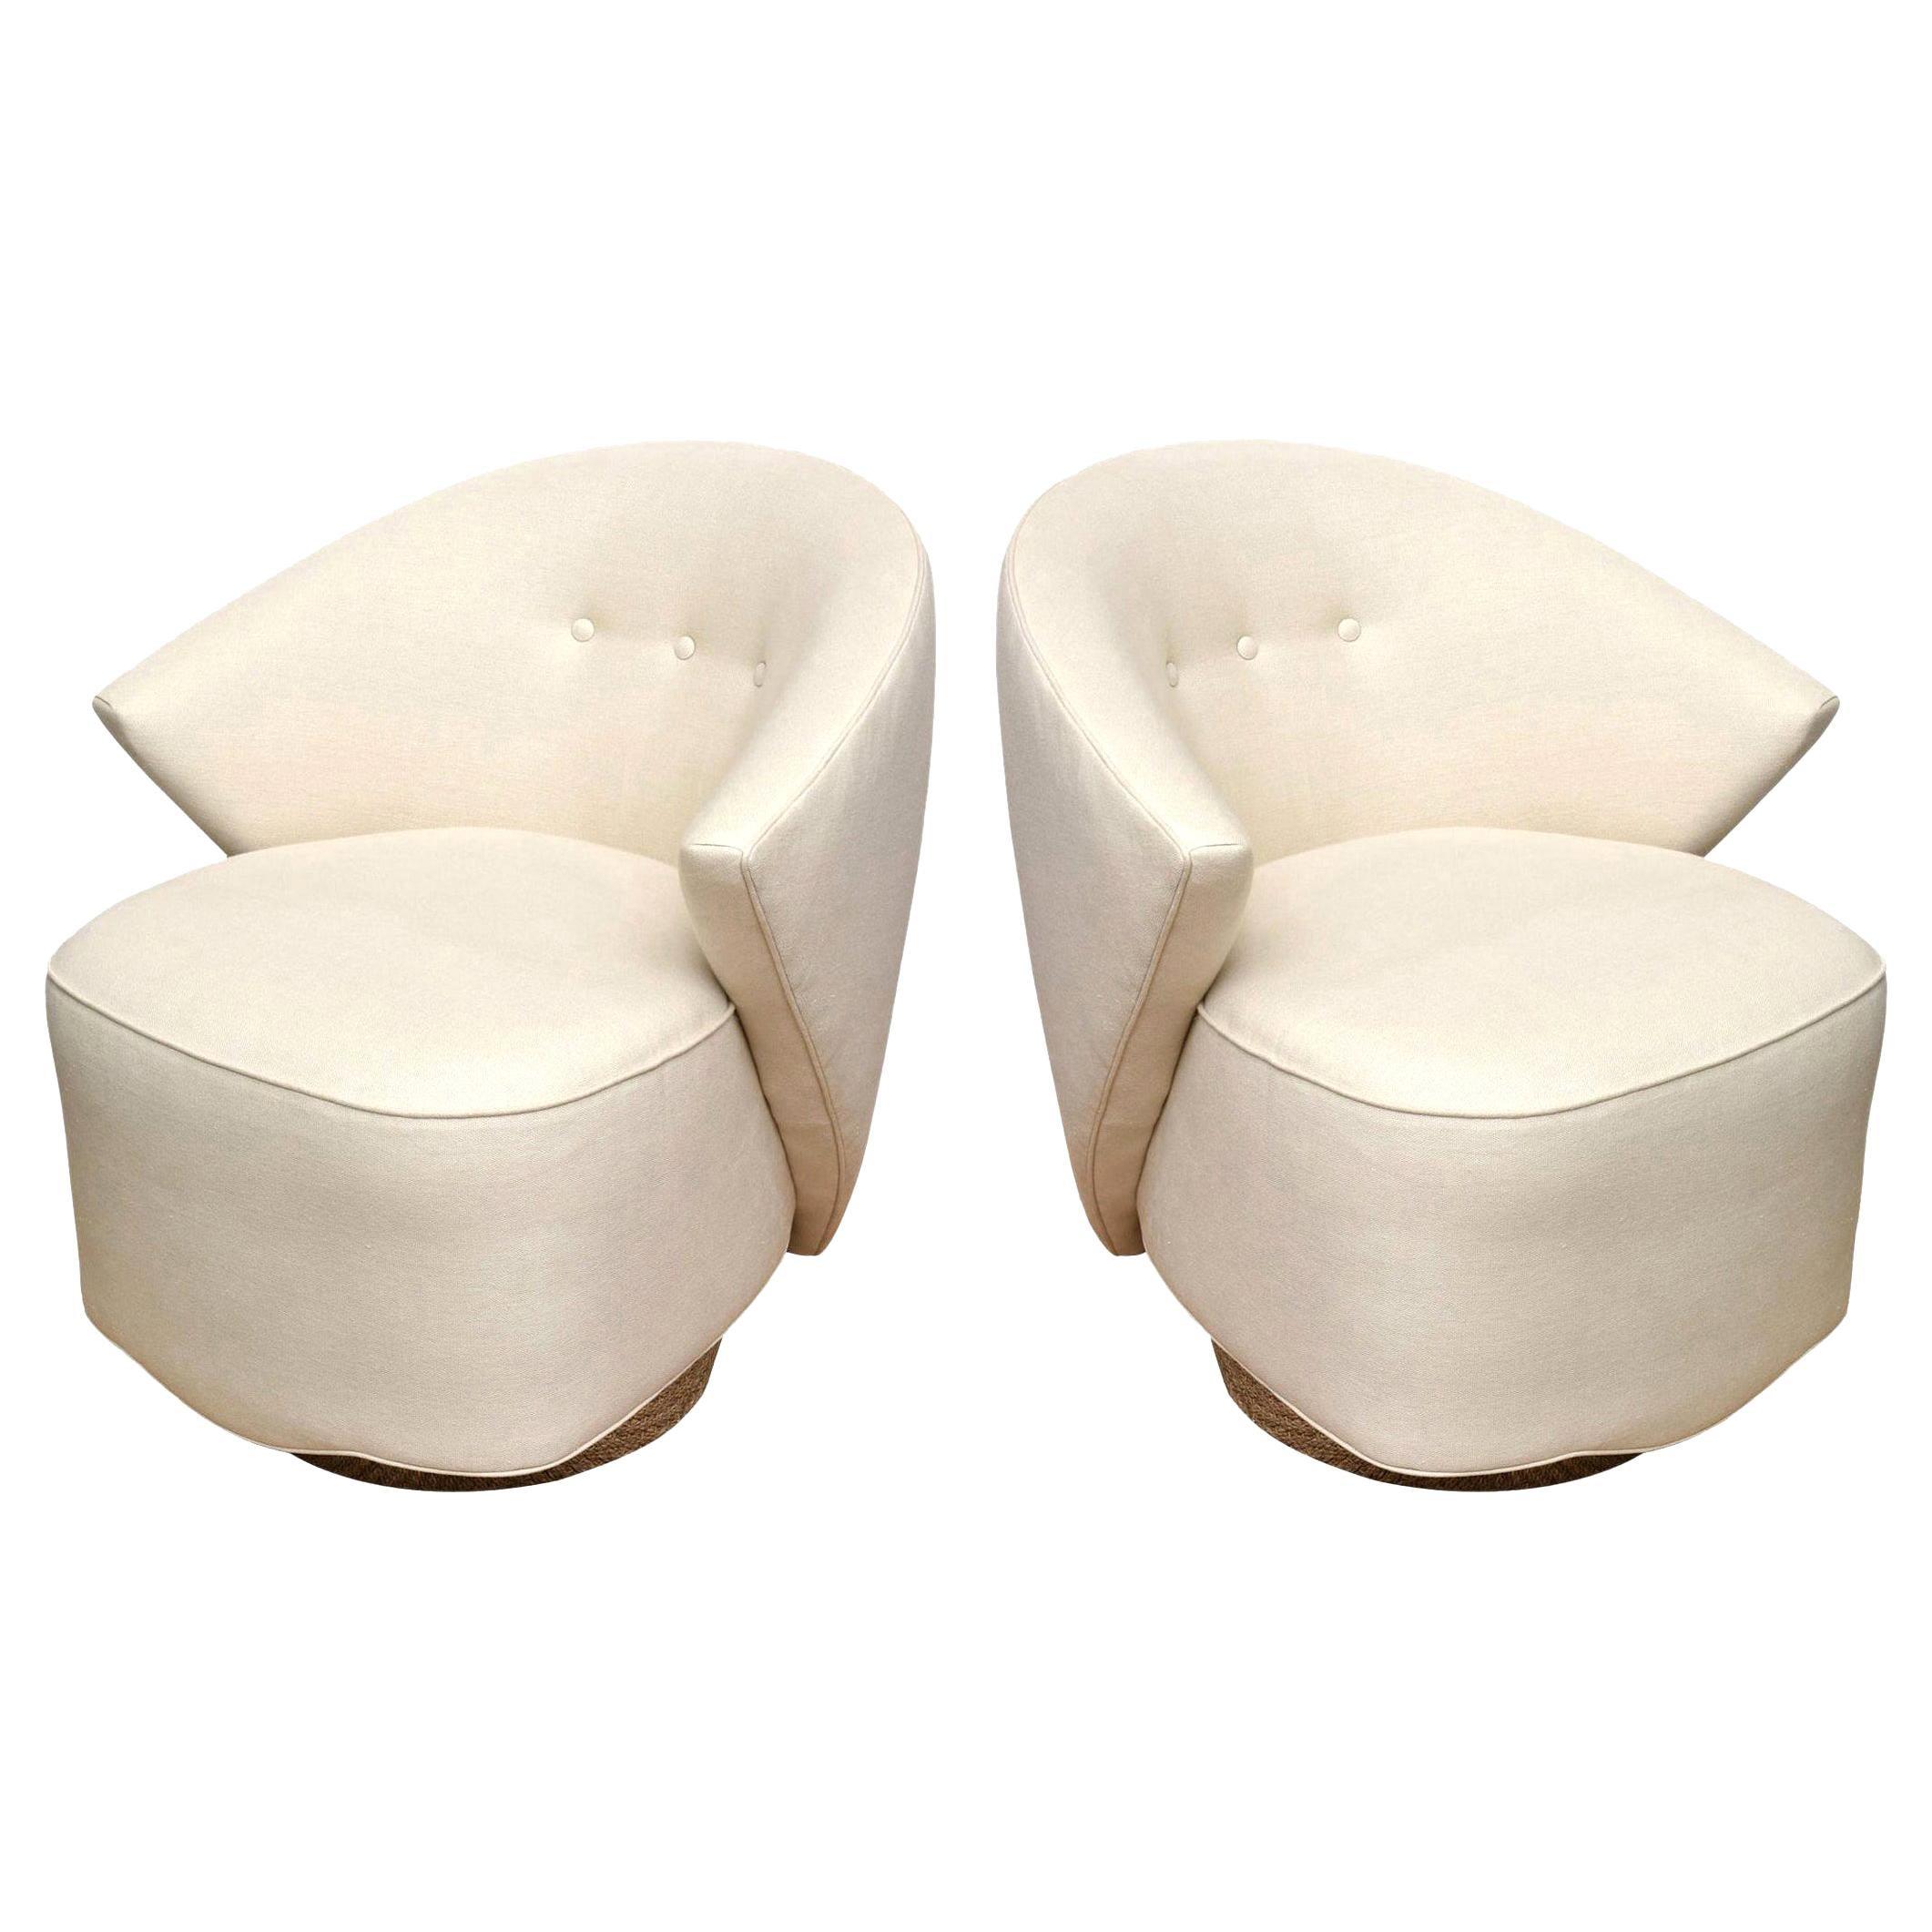 Milo Baughman Lounge Chairs 288 For